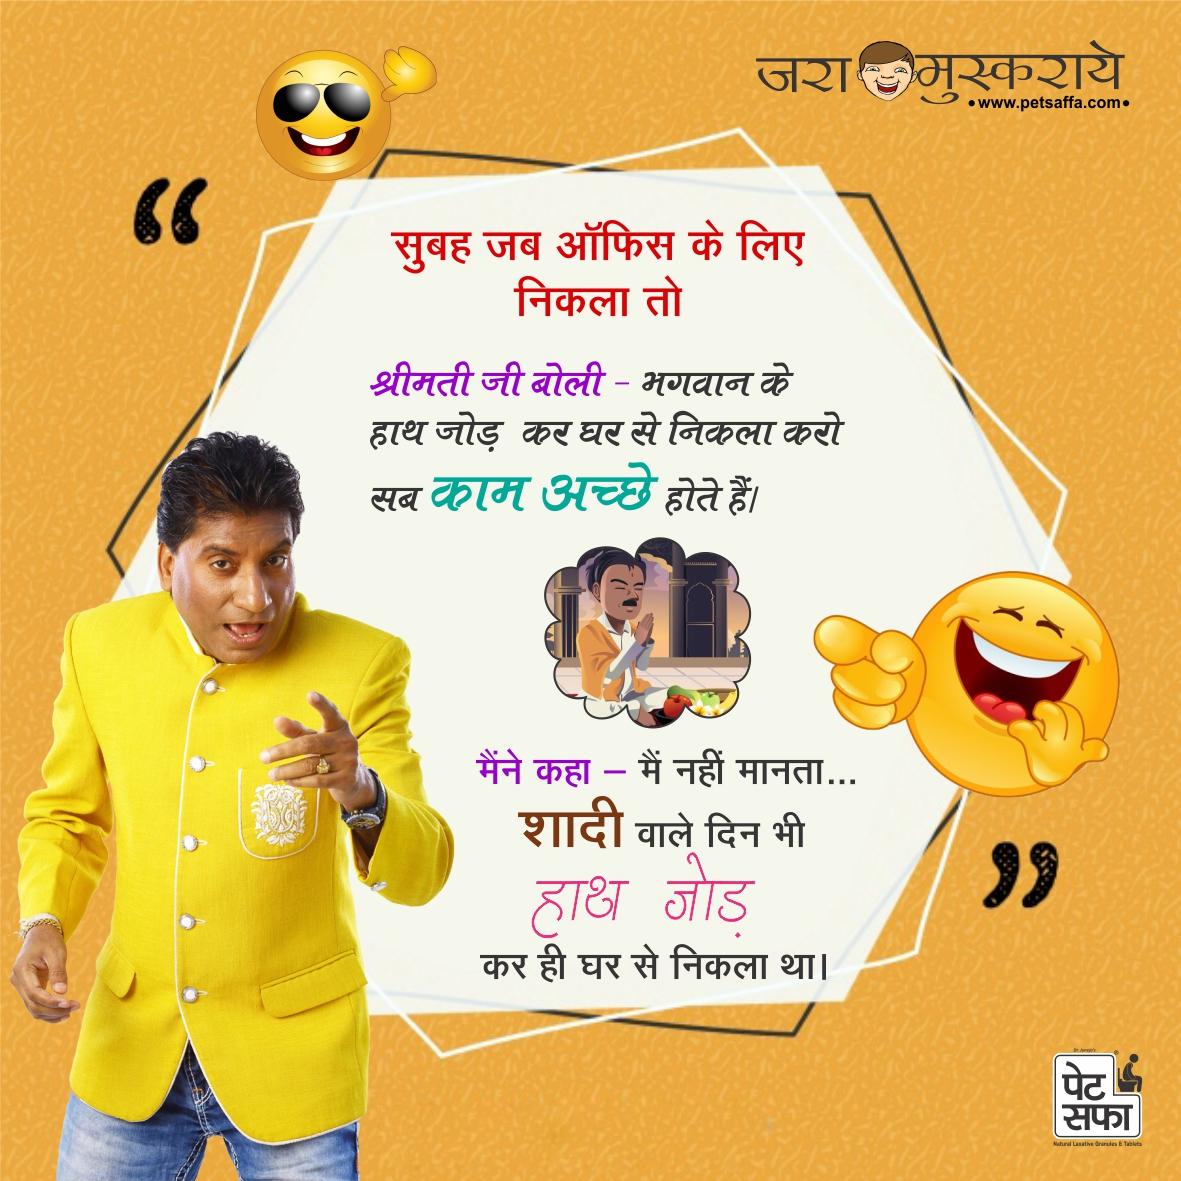 Really Funny Joke of The Day in Hindi – हिंदी चुटकुले ...